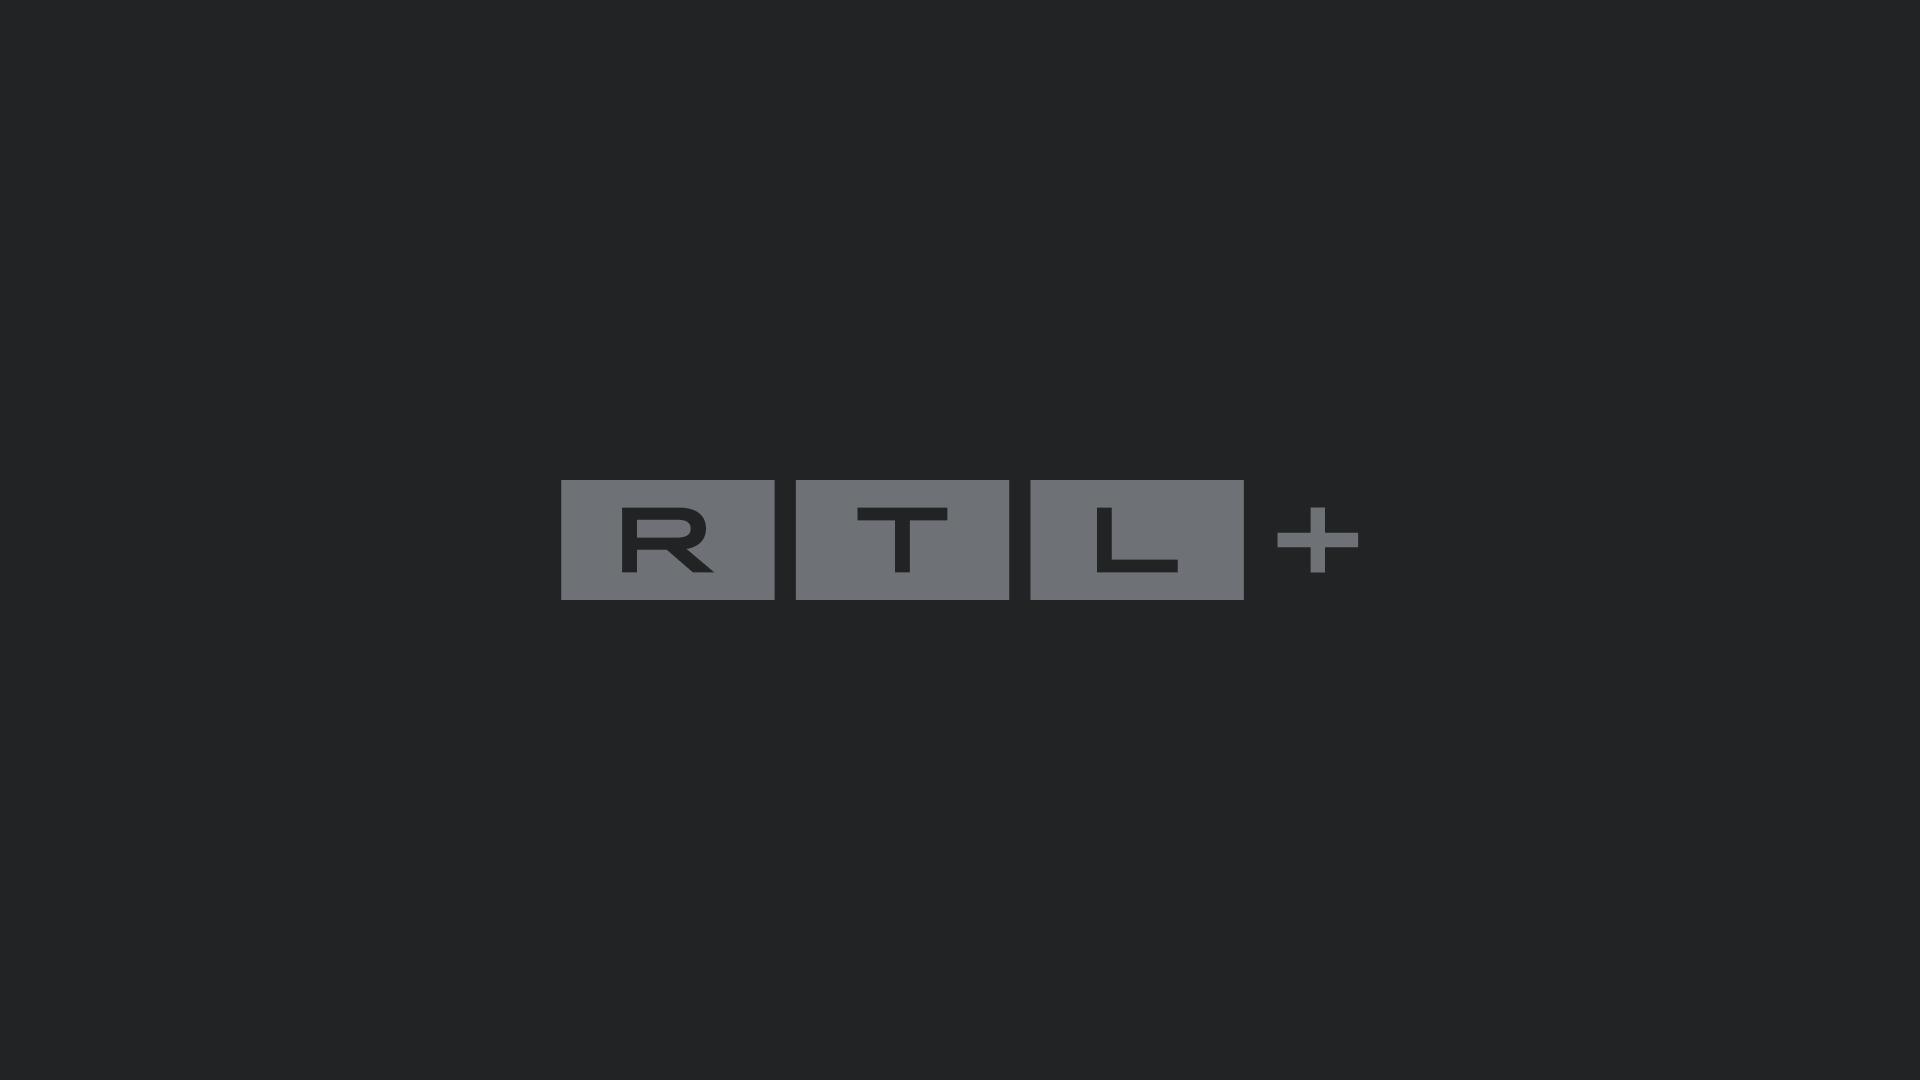 Die Fitness-Formel